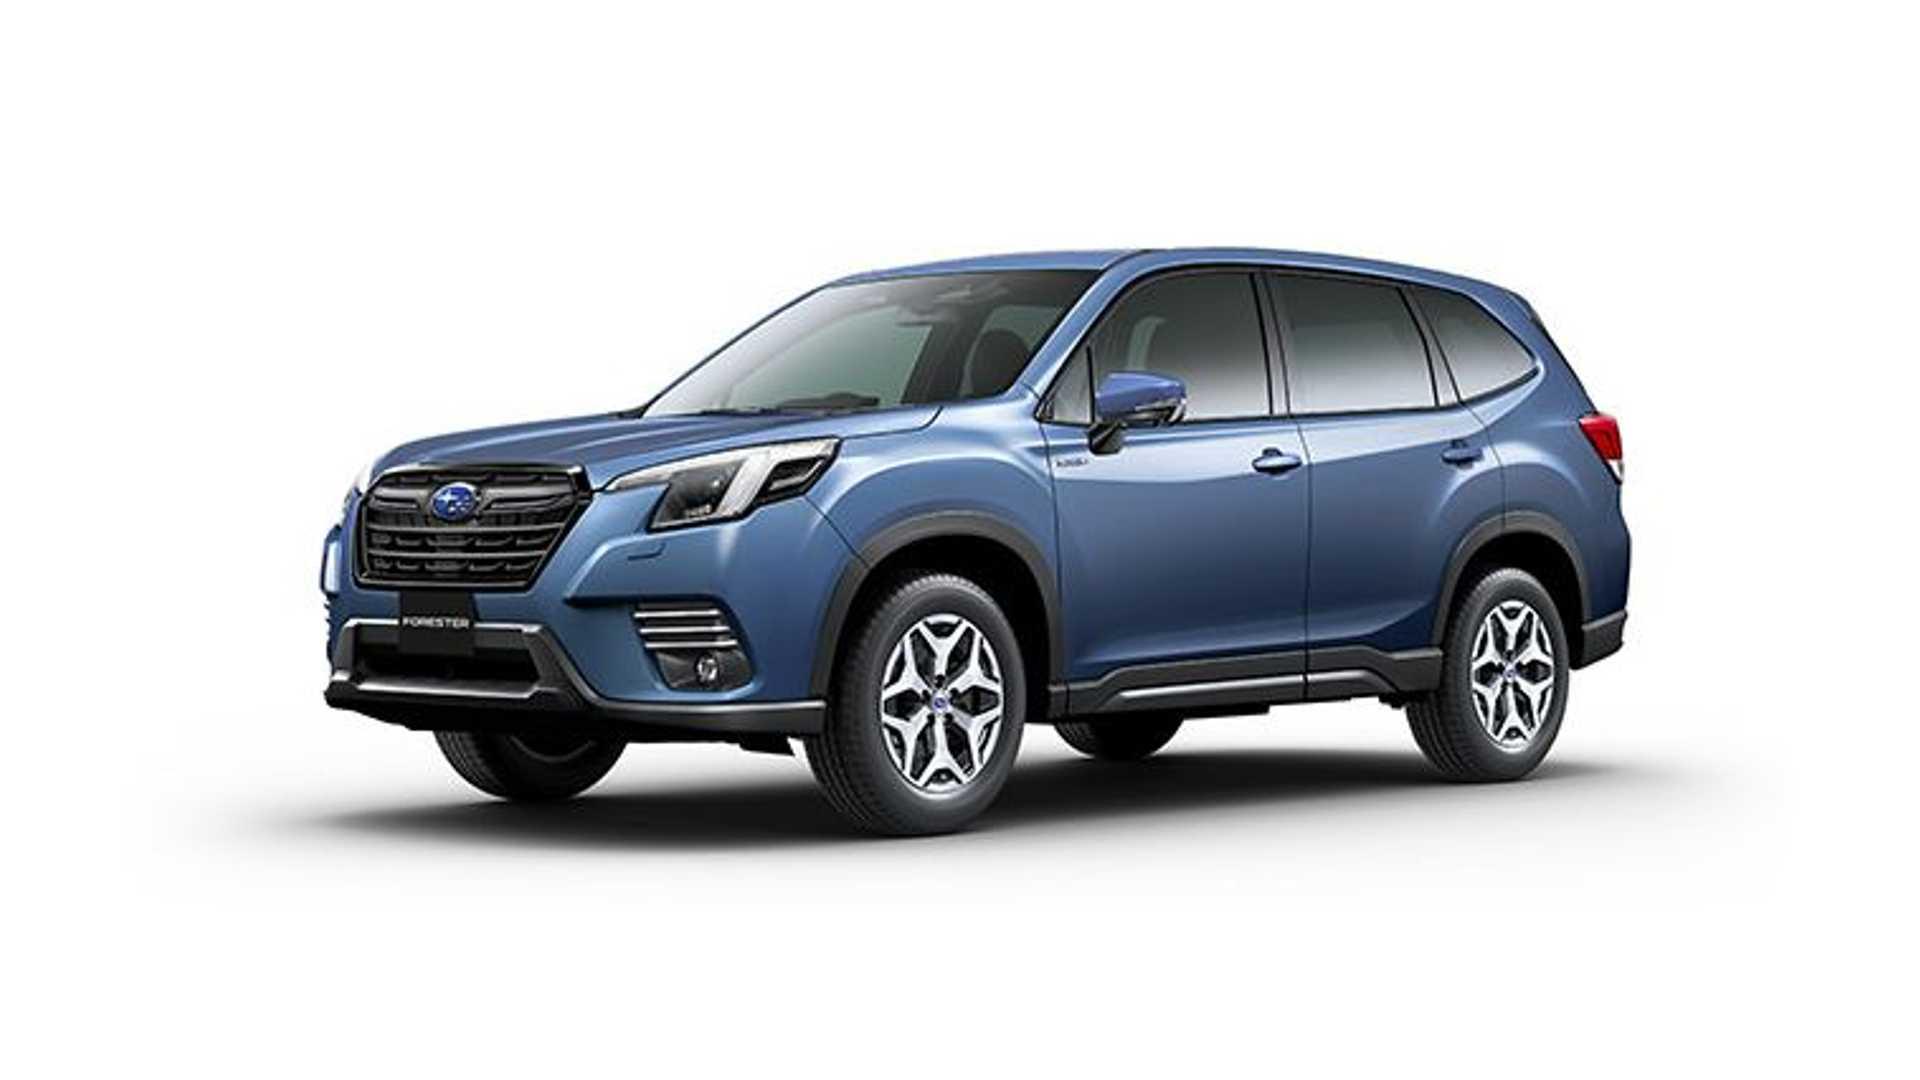 Subaru-Forester-facelift-35